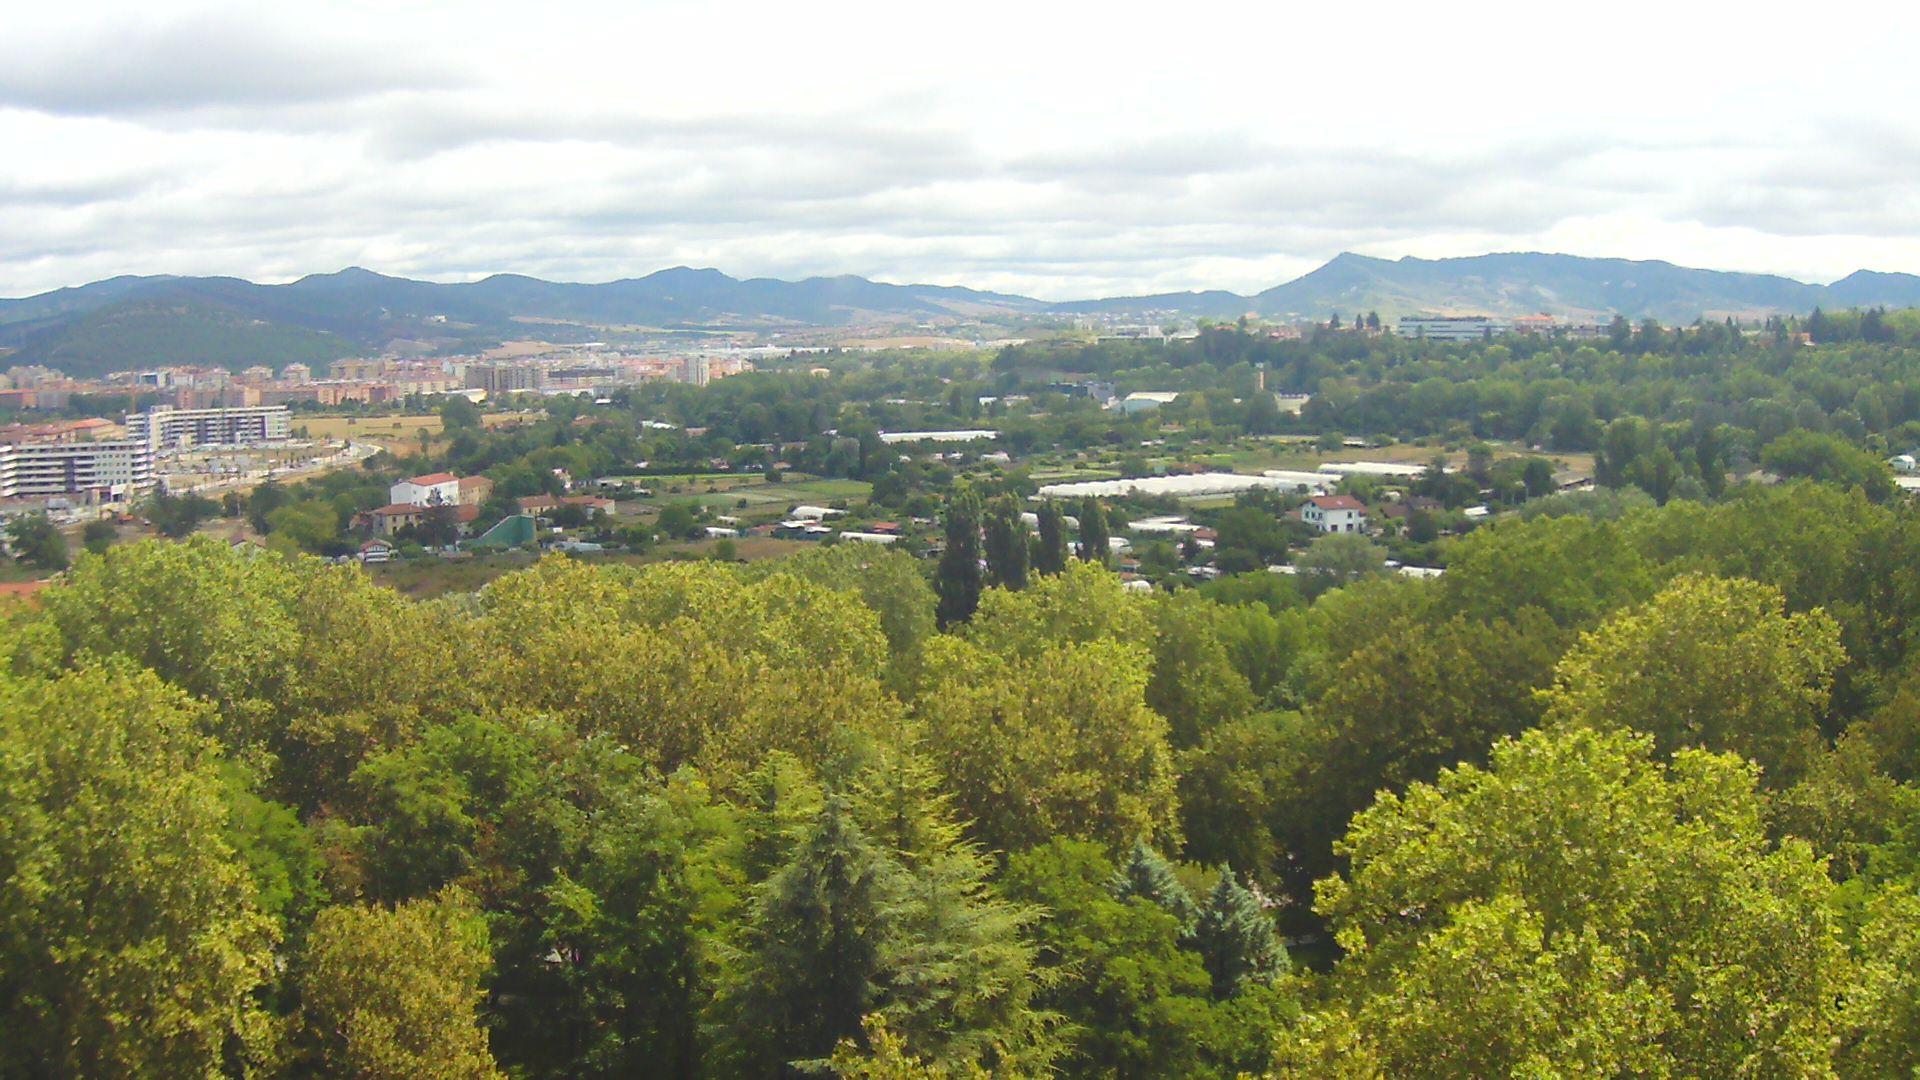 Pamplona So. 12:46